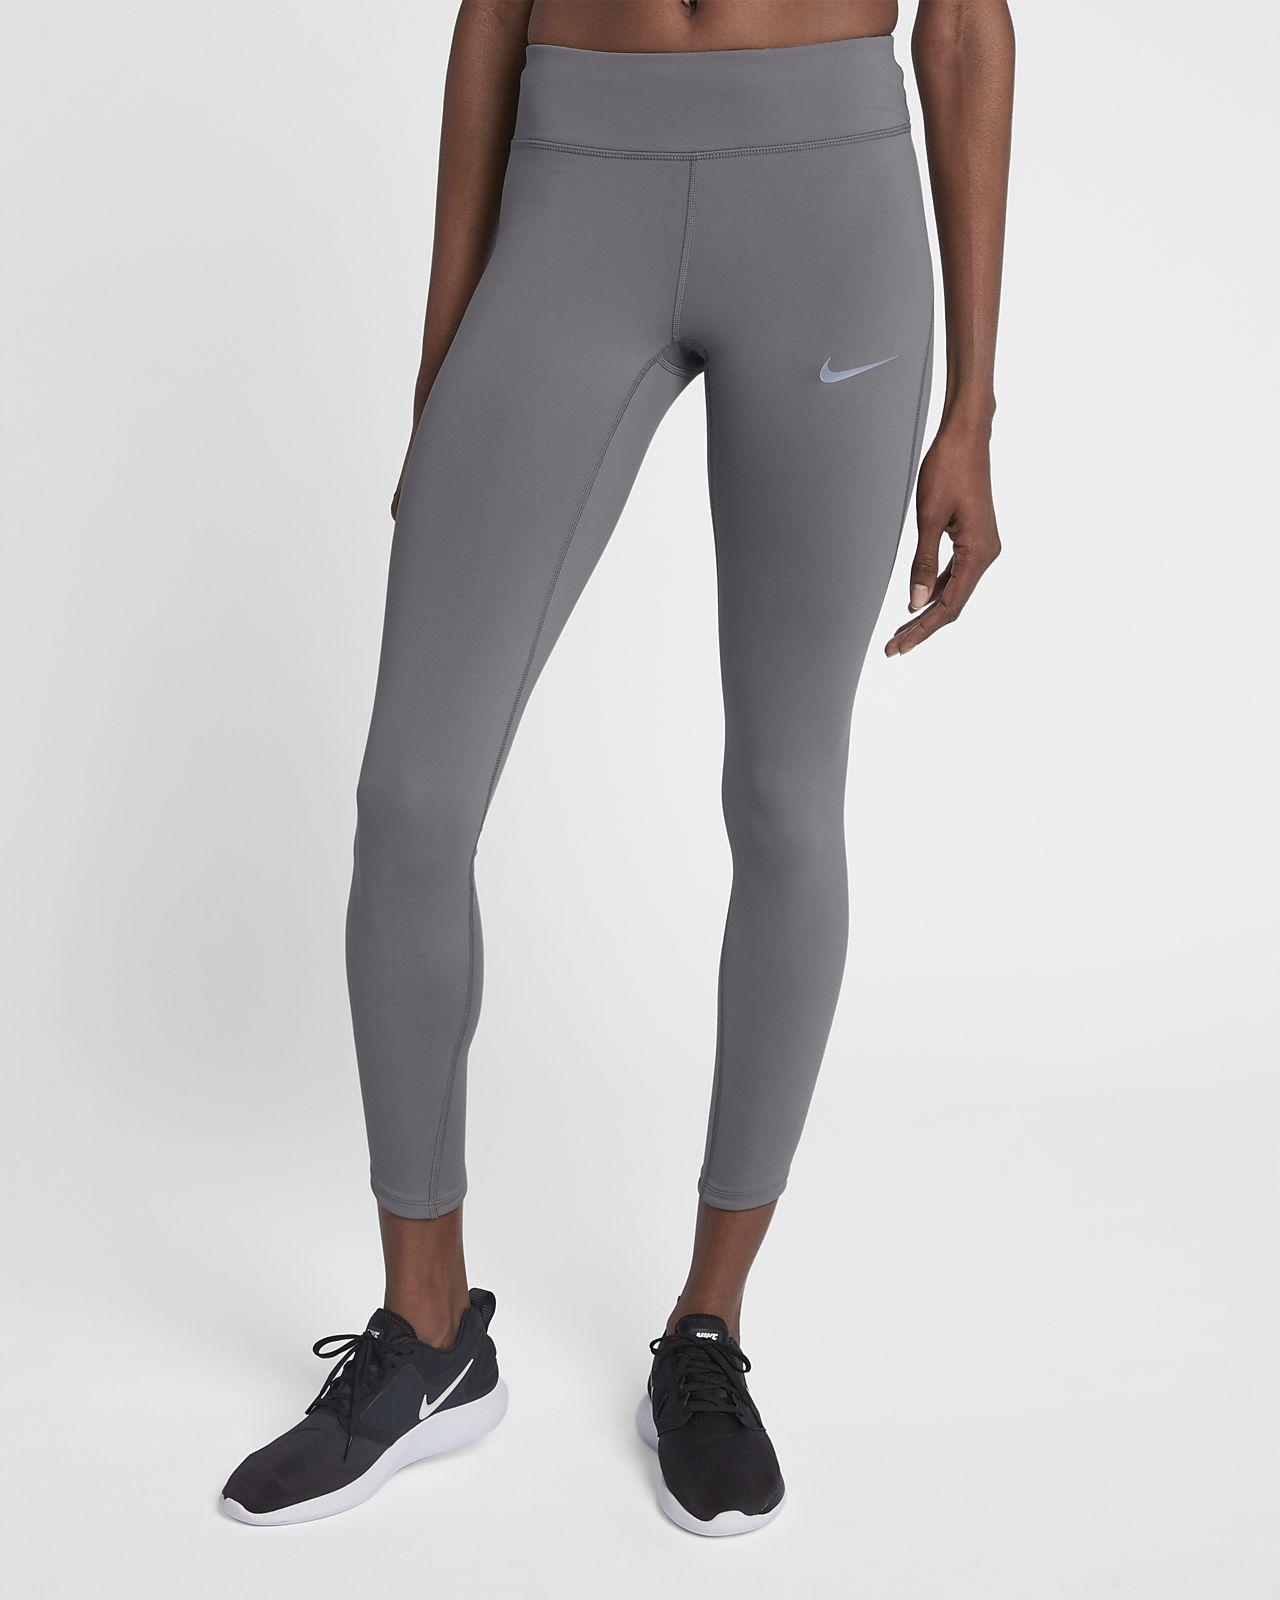 Tight de running taille mi-basse Nike Epic Lux pour Femme